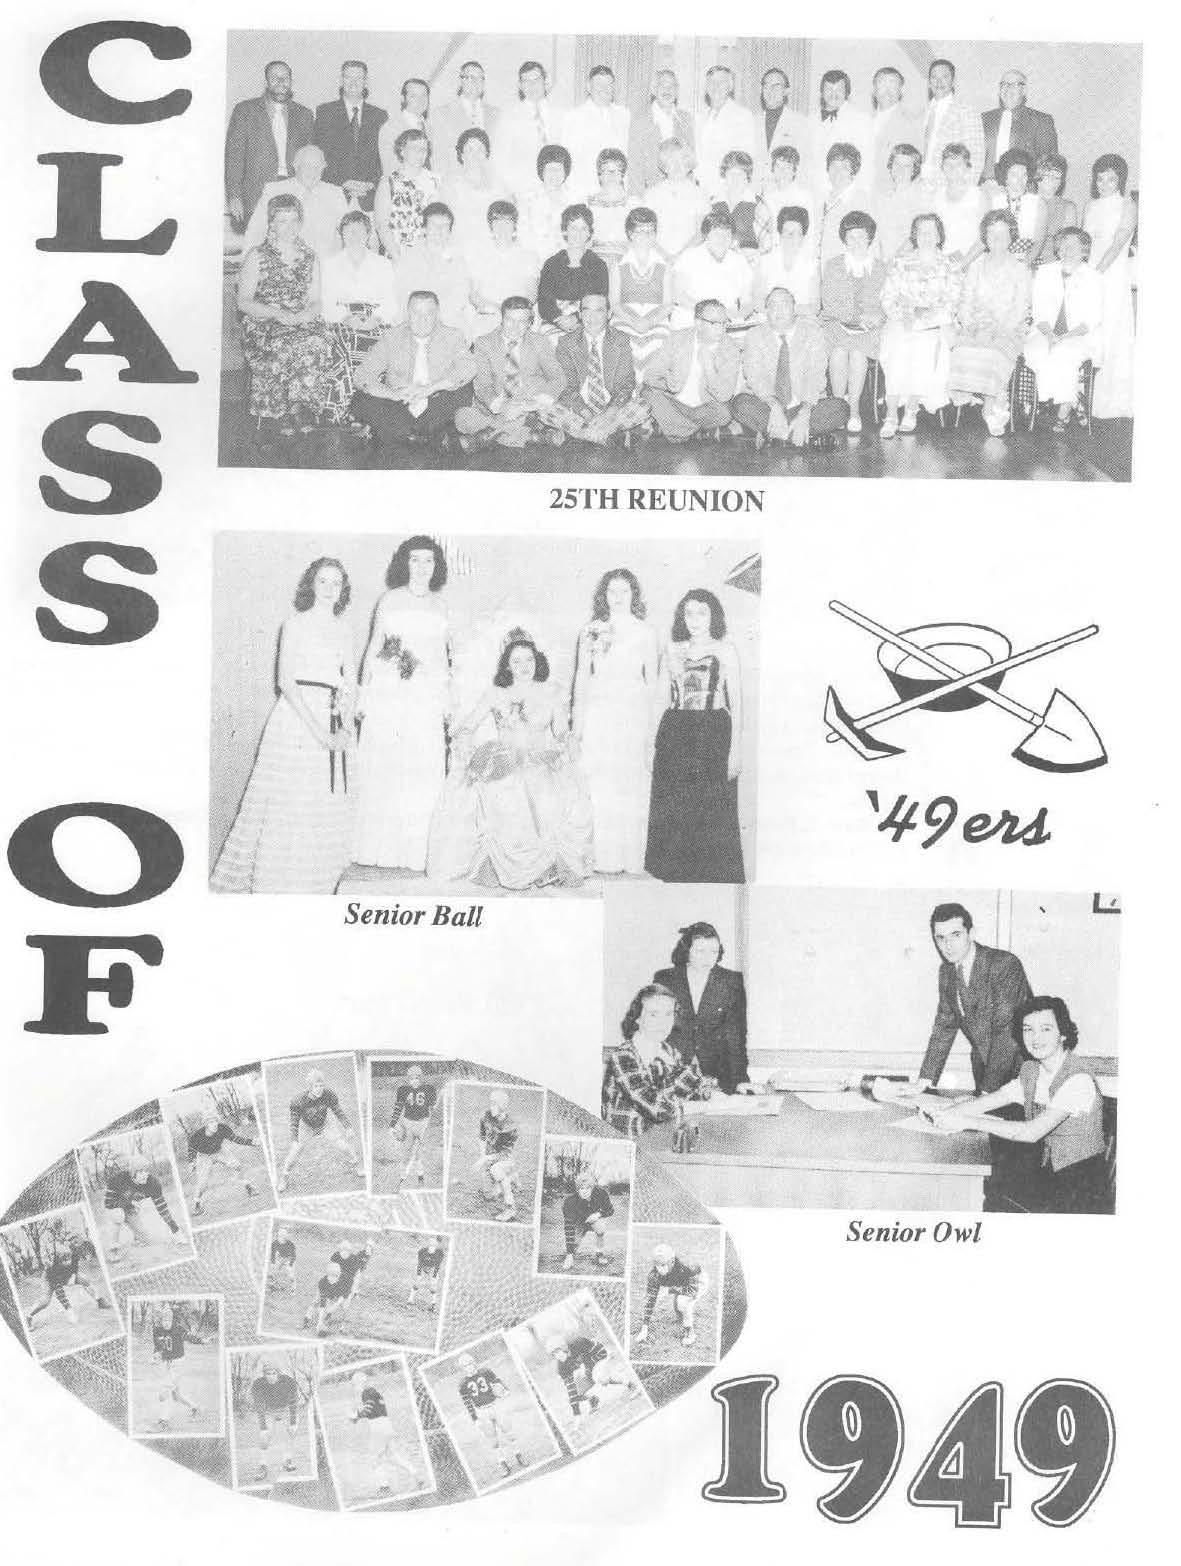 1994 1949